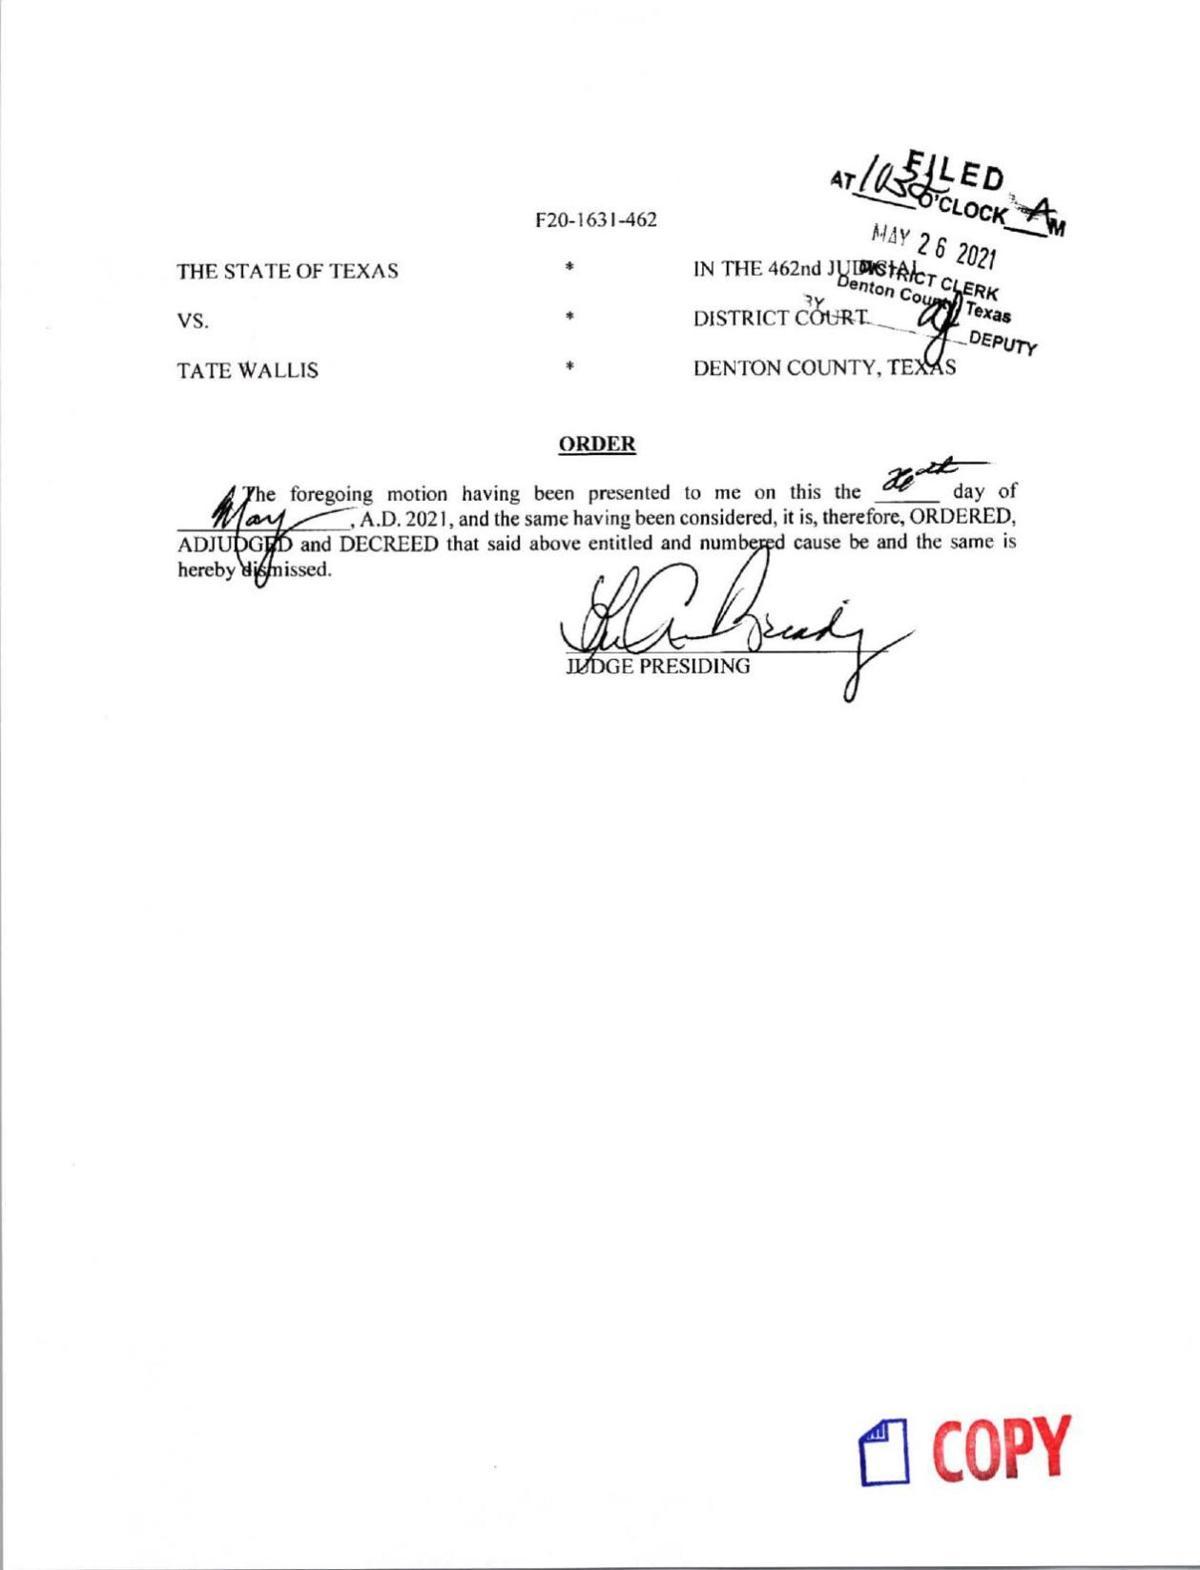 Wallis charges dismissed